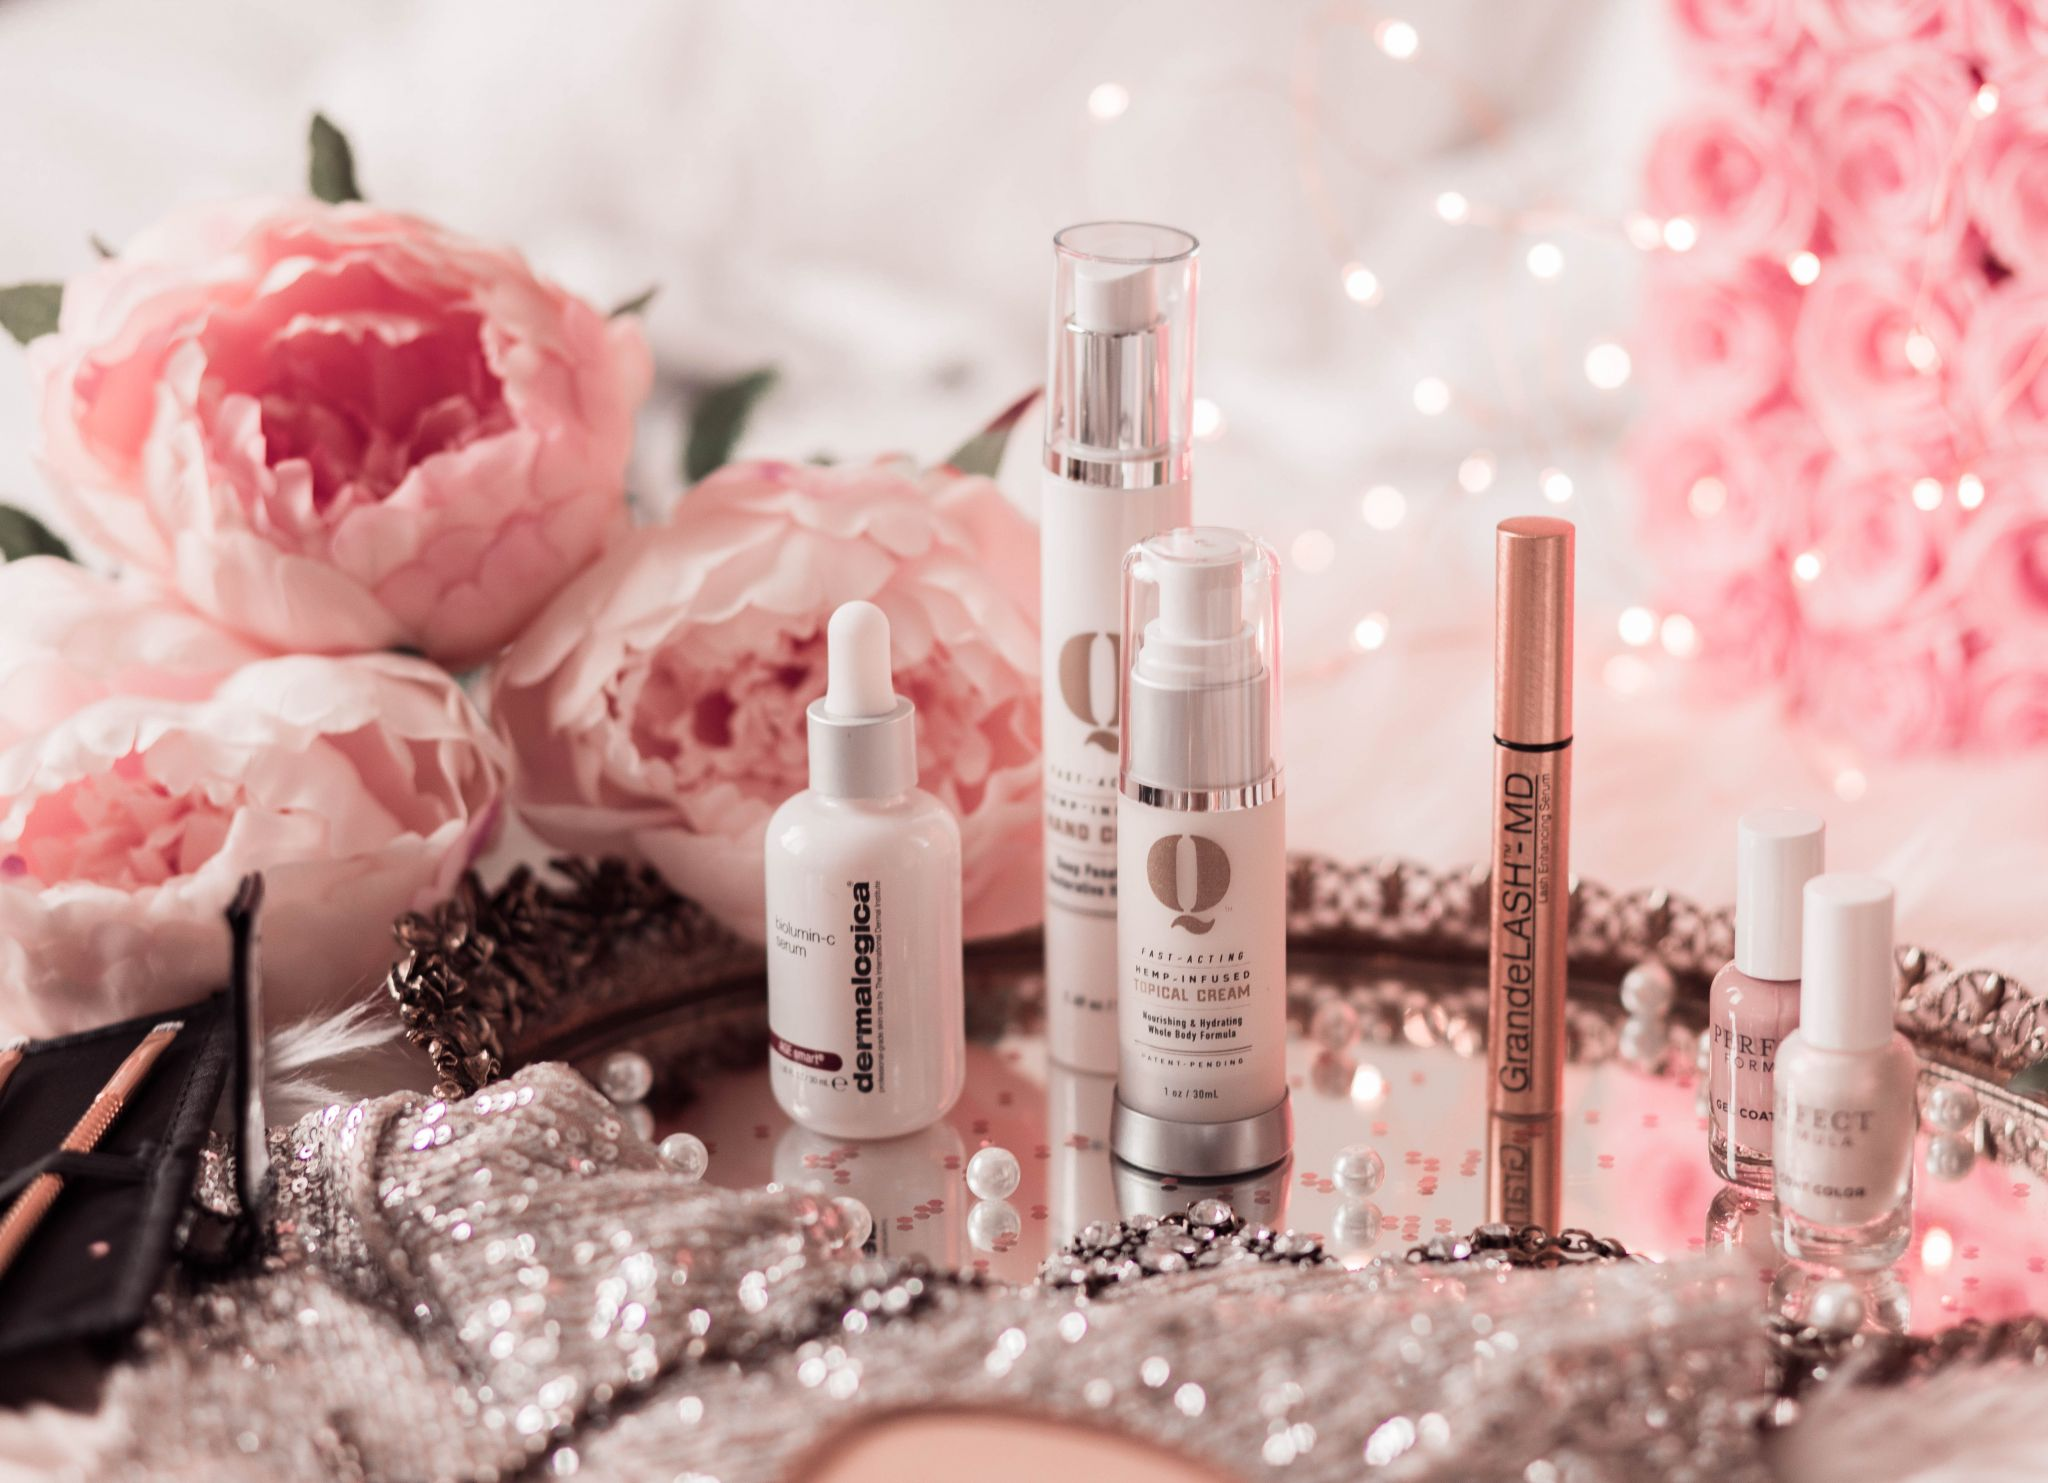 ocsar-worthy beauty products